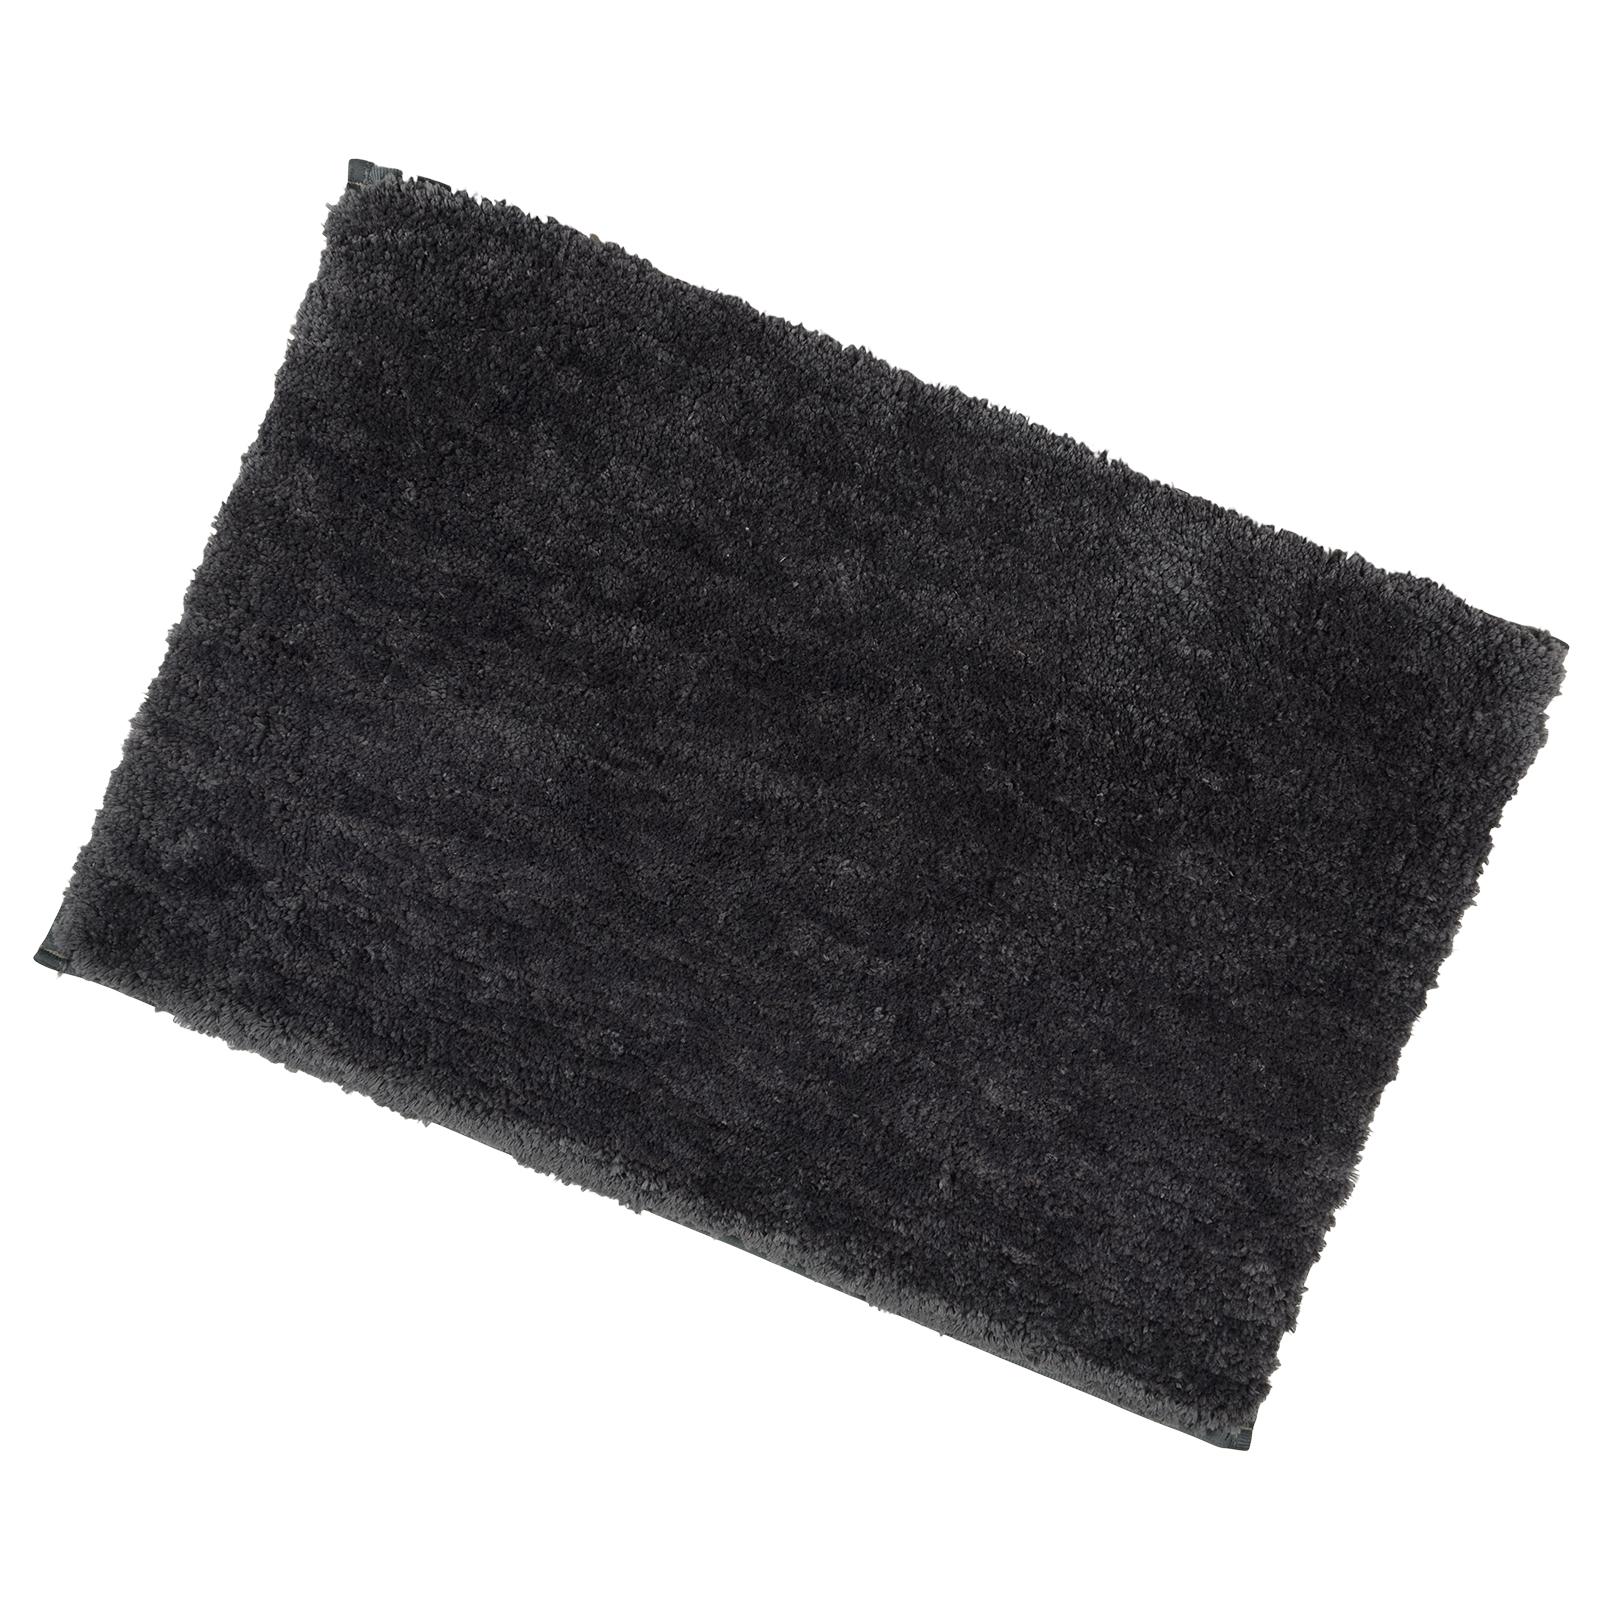 40x60cm slate tufted microfibre shower bath mat rug non slip backing bamboobliss. Black Bedroom Furniture Sets. Home Design Ideas